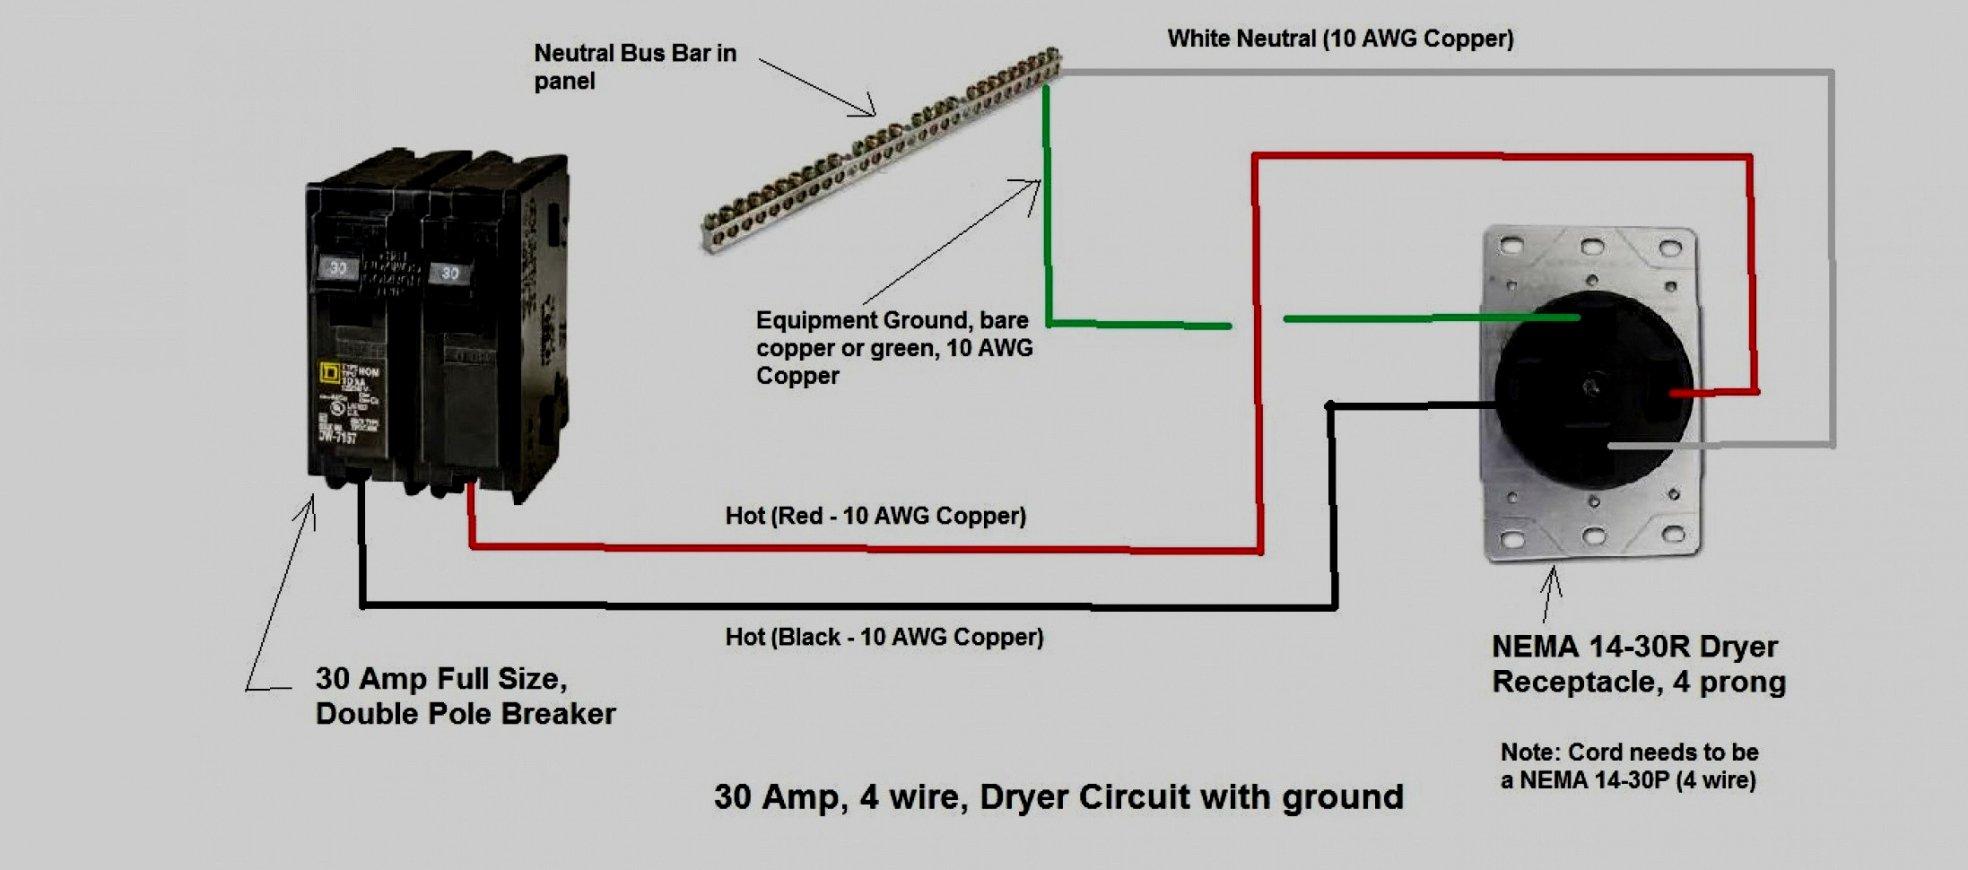 DIAGRAM] 240 Volt 30 Amp Wiring Diagram FULL Version HD Quality Wiring  Diagram - AAWIRINGLOOM.MAMI-WATA.FRMami Wata